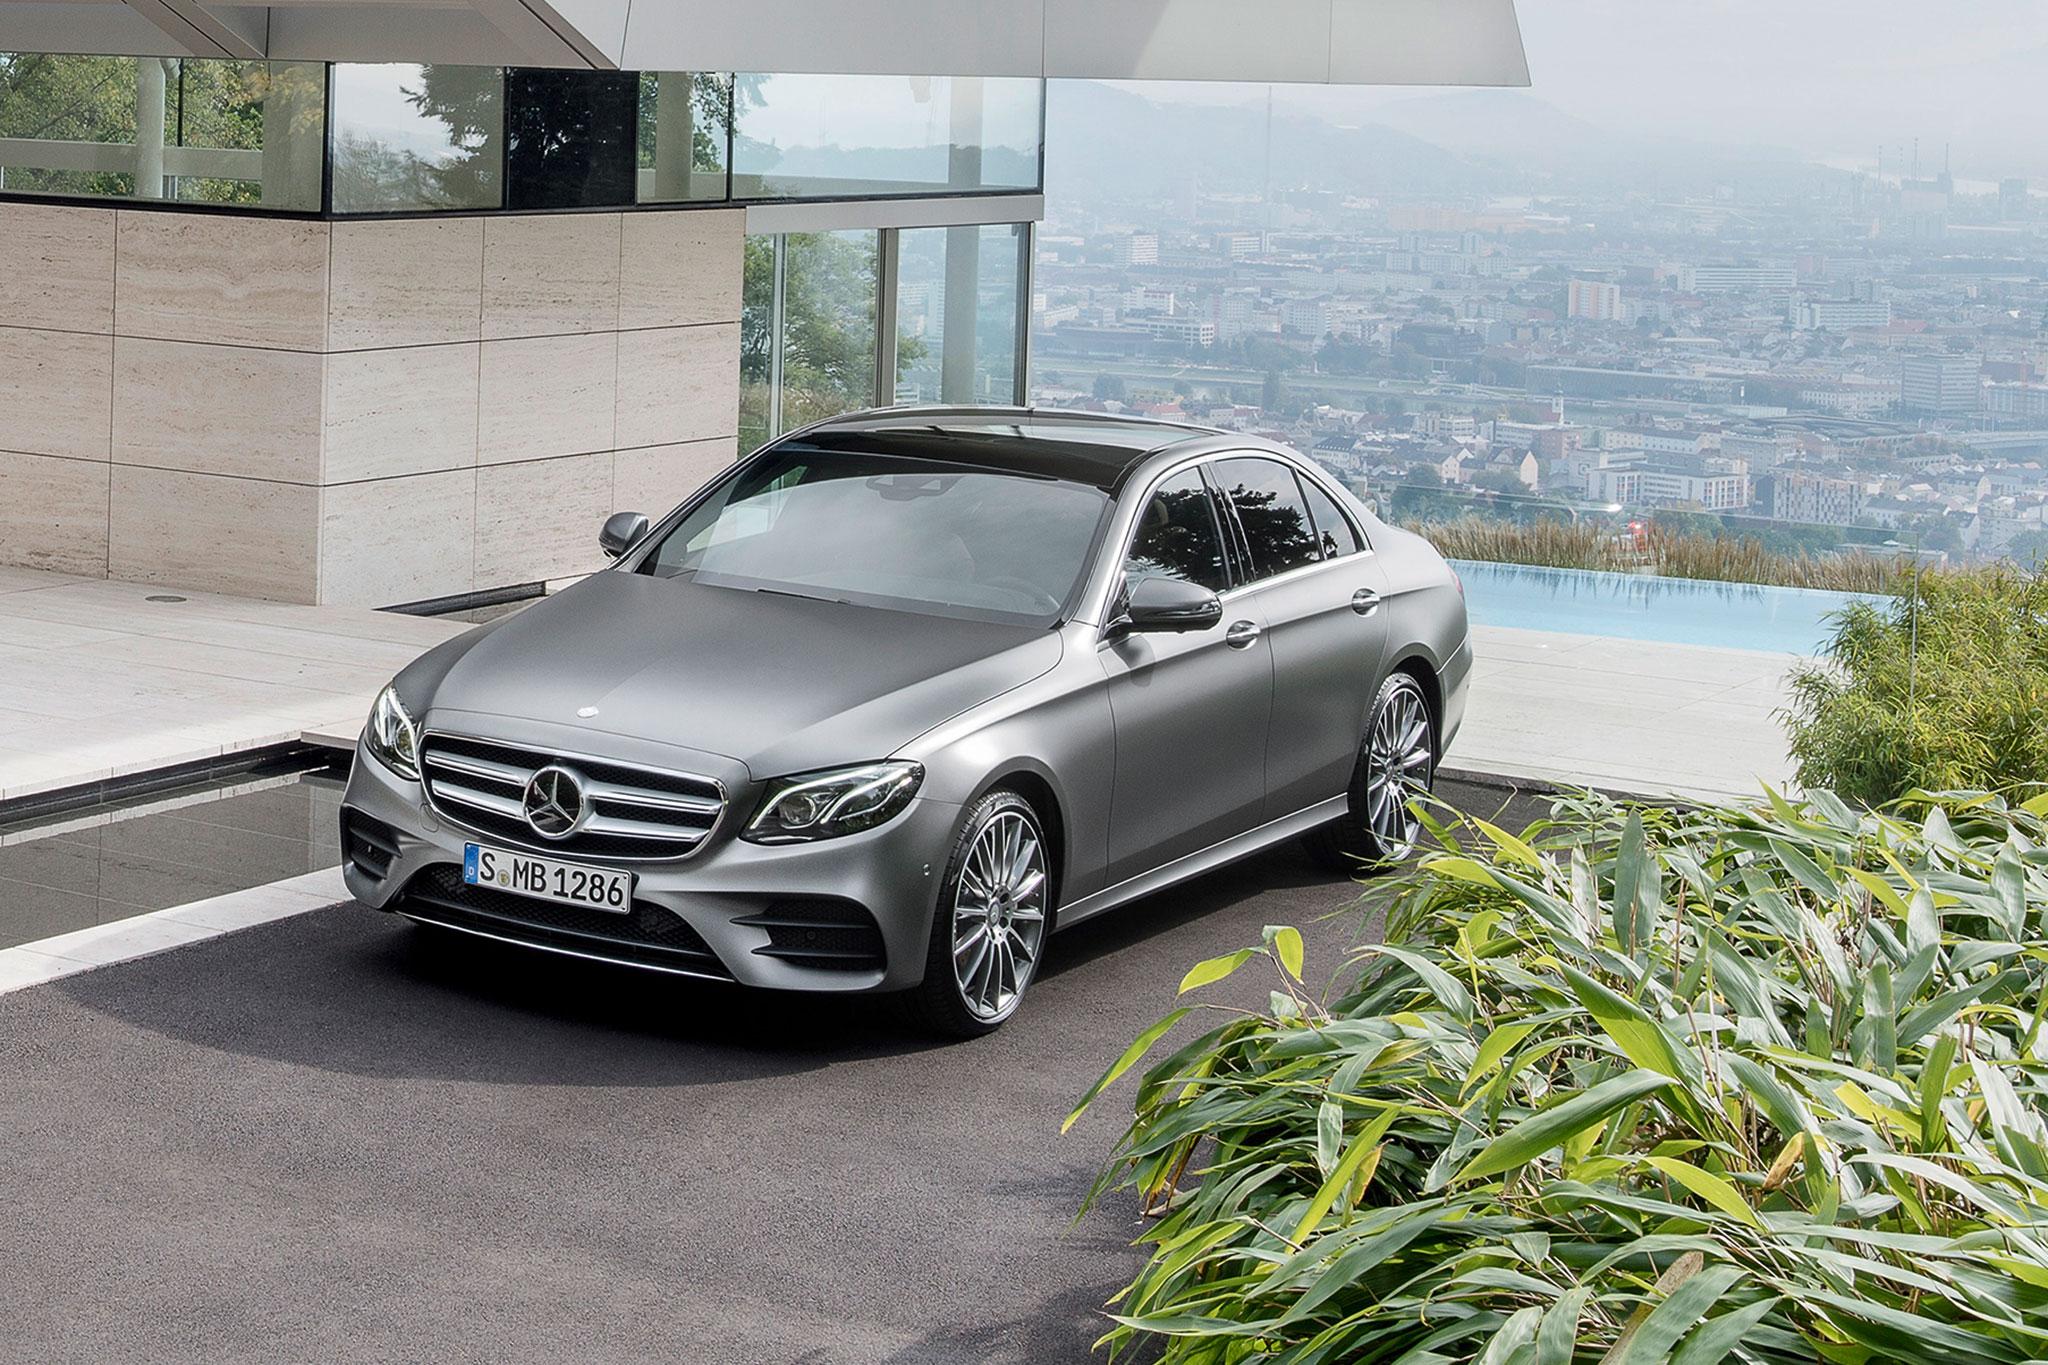 2017 mercedes benz e class debuts with sleek looks tons for Mercedes benz e300 diesel